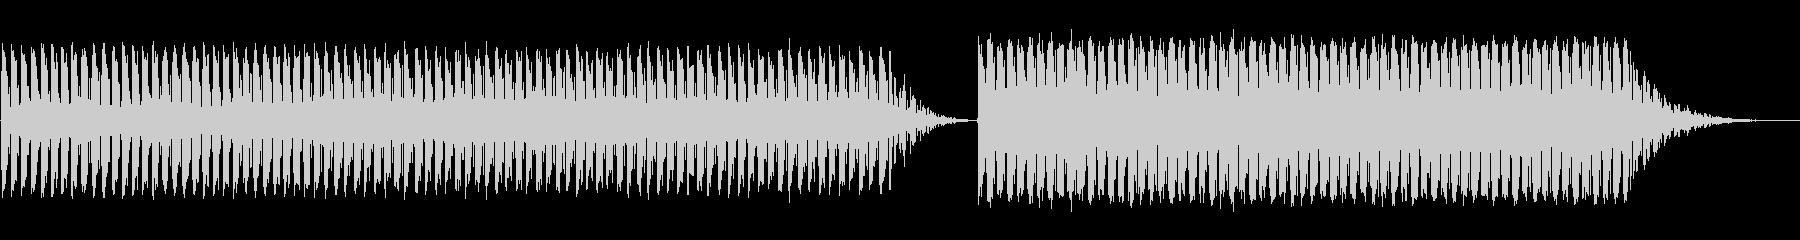 【Lofi】とにかくやかましいアラーム音の未再生の波形